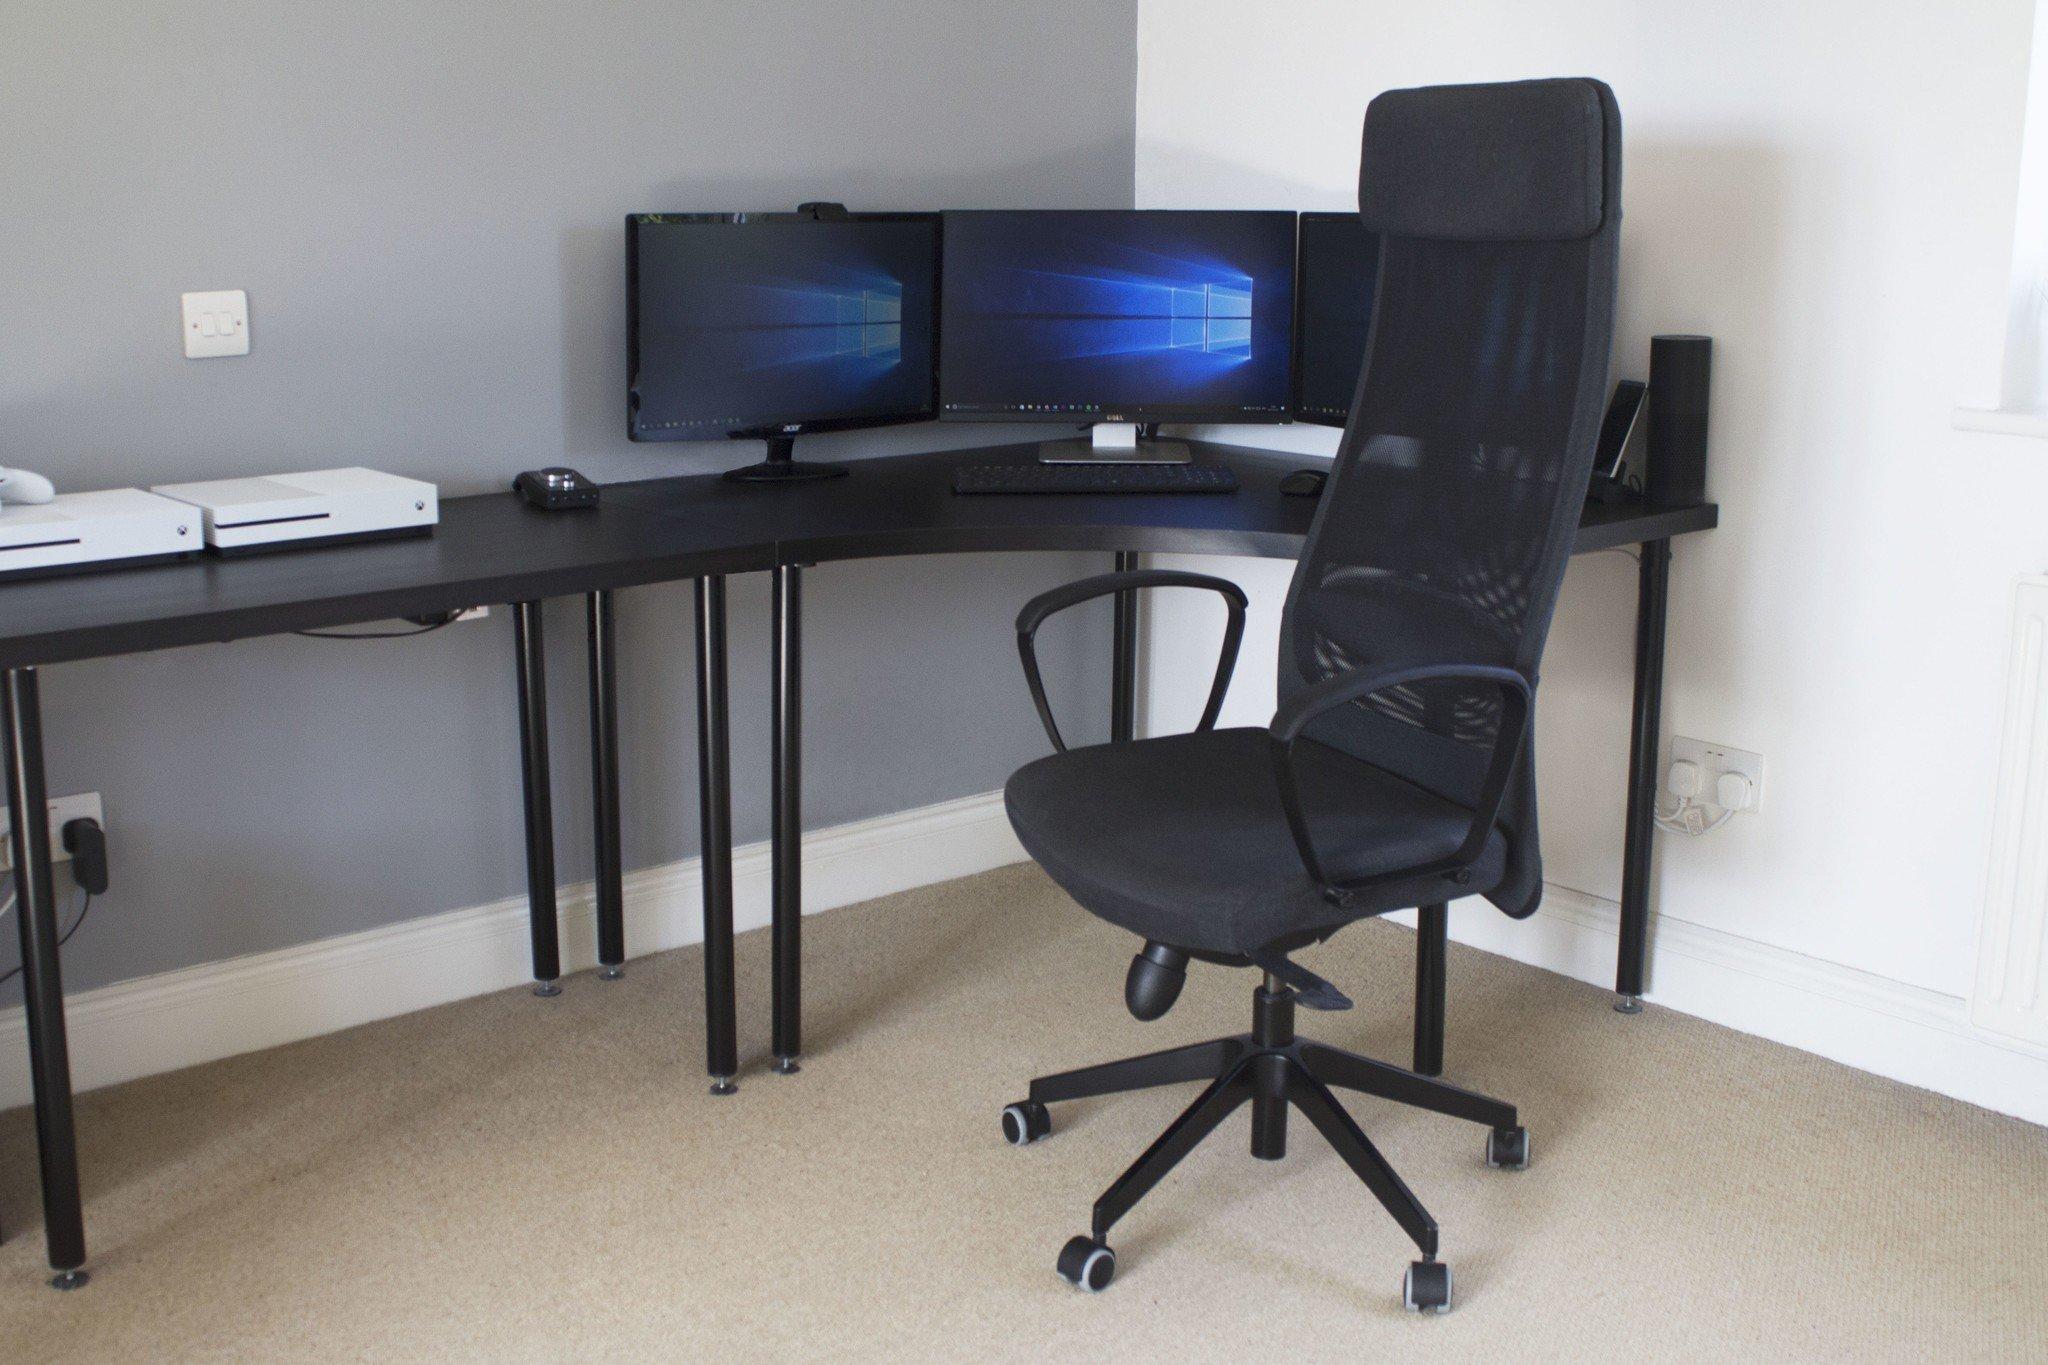 Best Office Chairs Under $200 In 2018